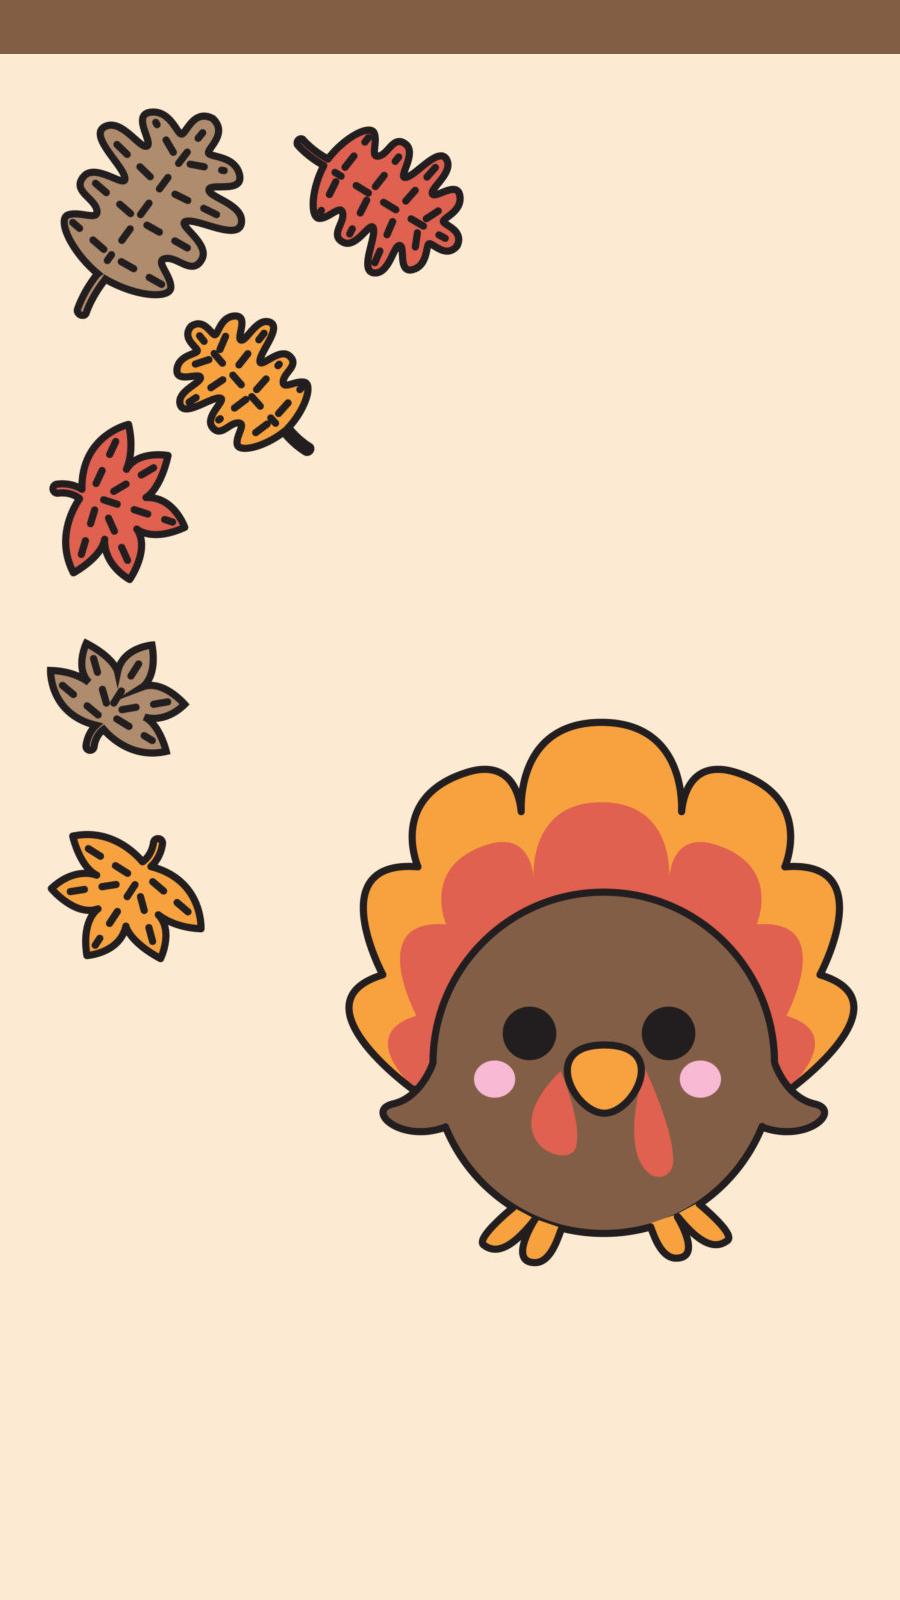 LuvNote2 AGe Fall wallpaper, Cute fall wallpaper